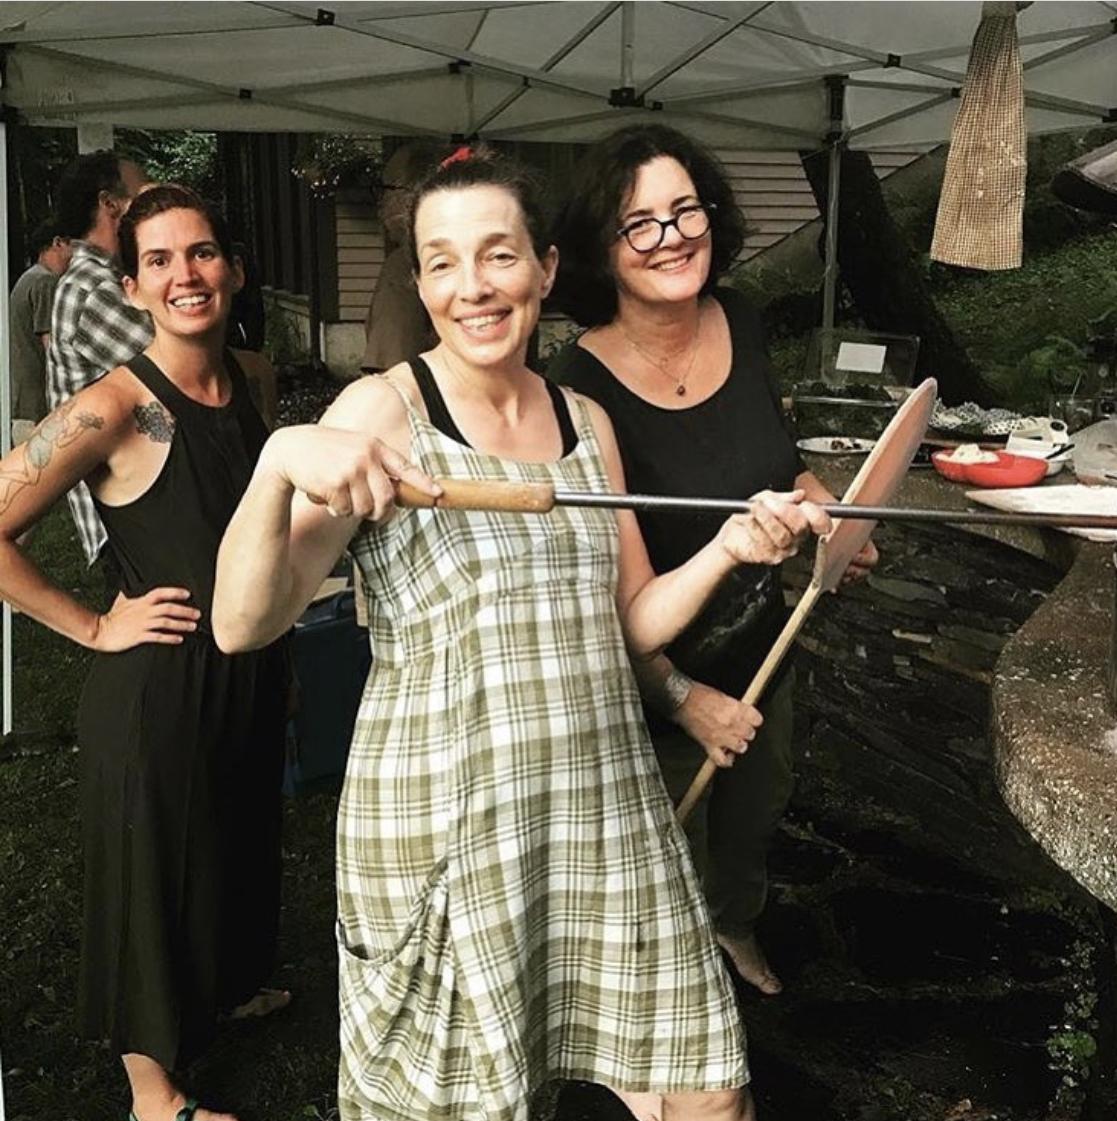 July 2018 - barefoot & baking